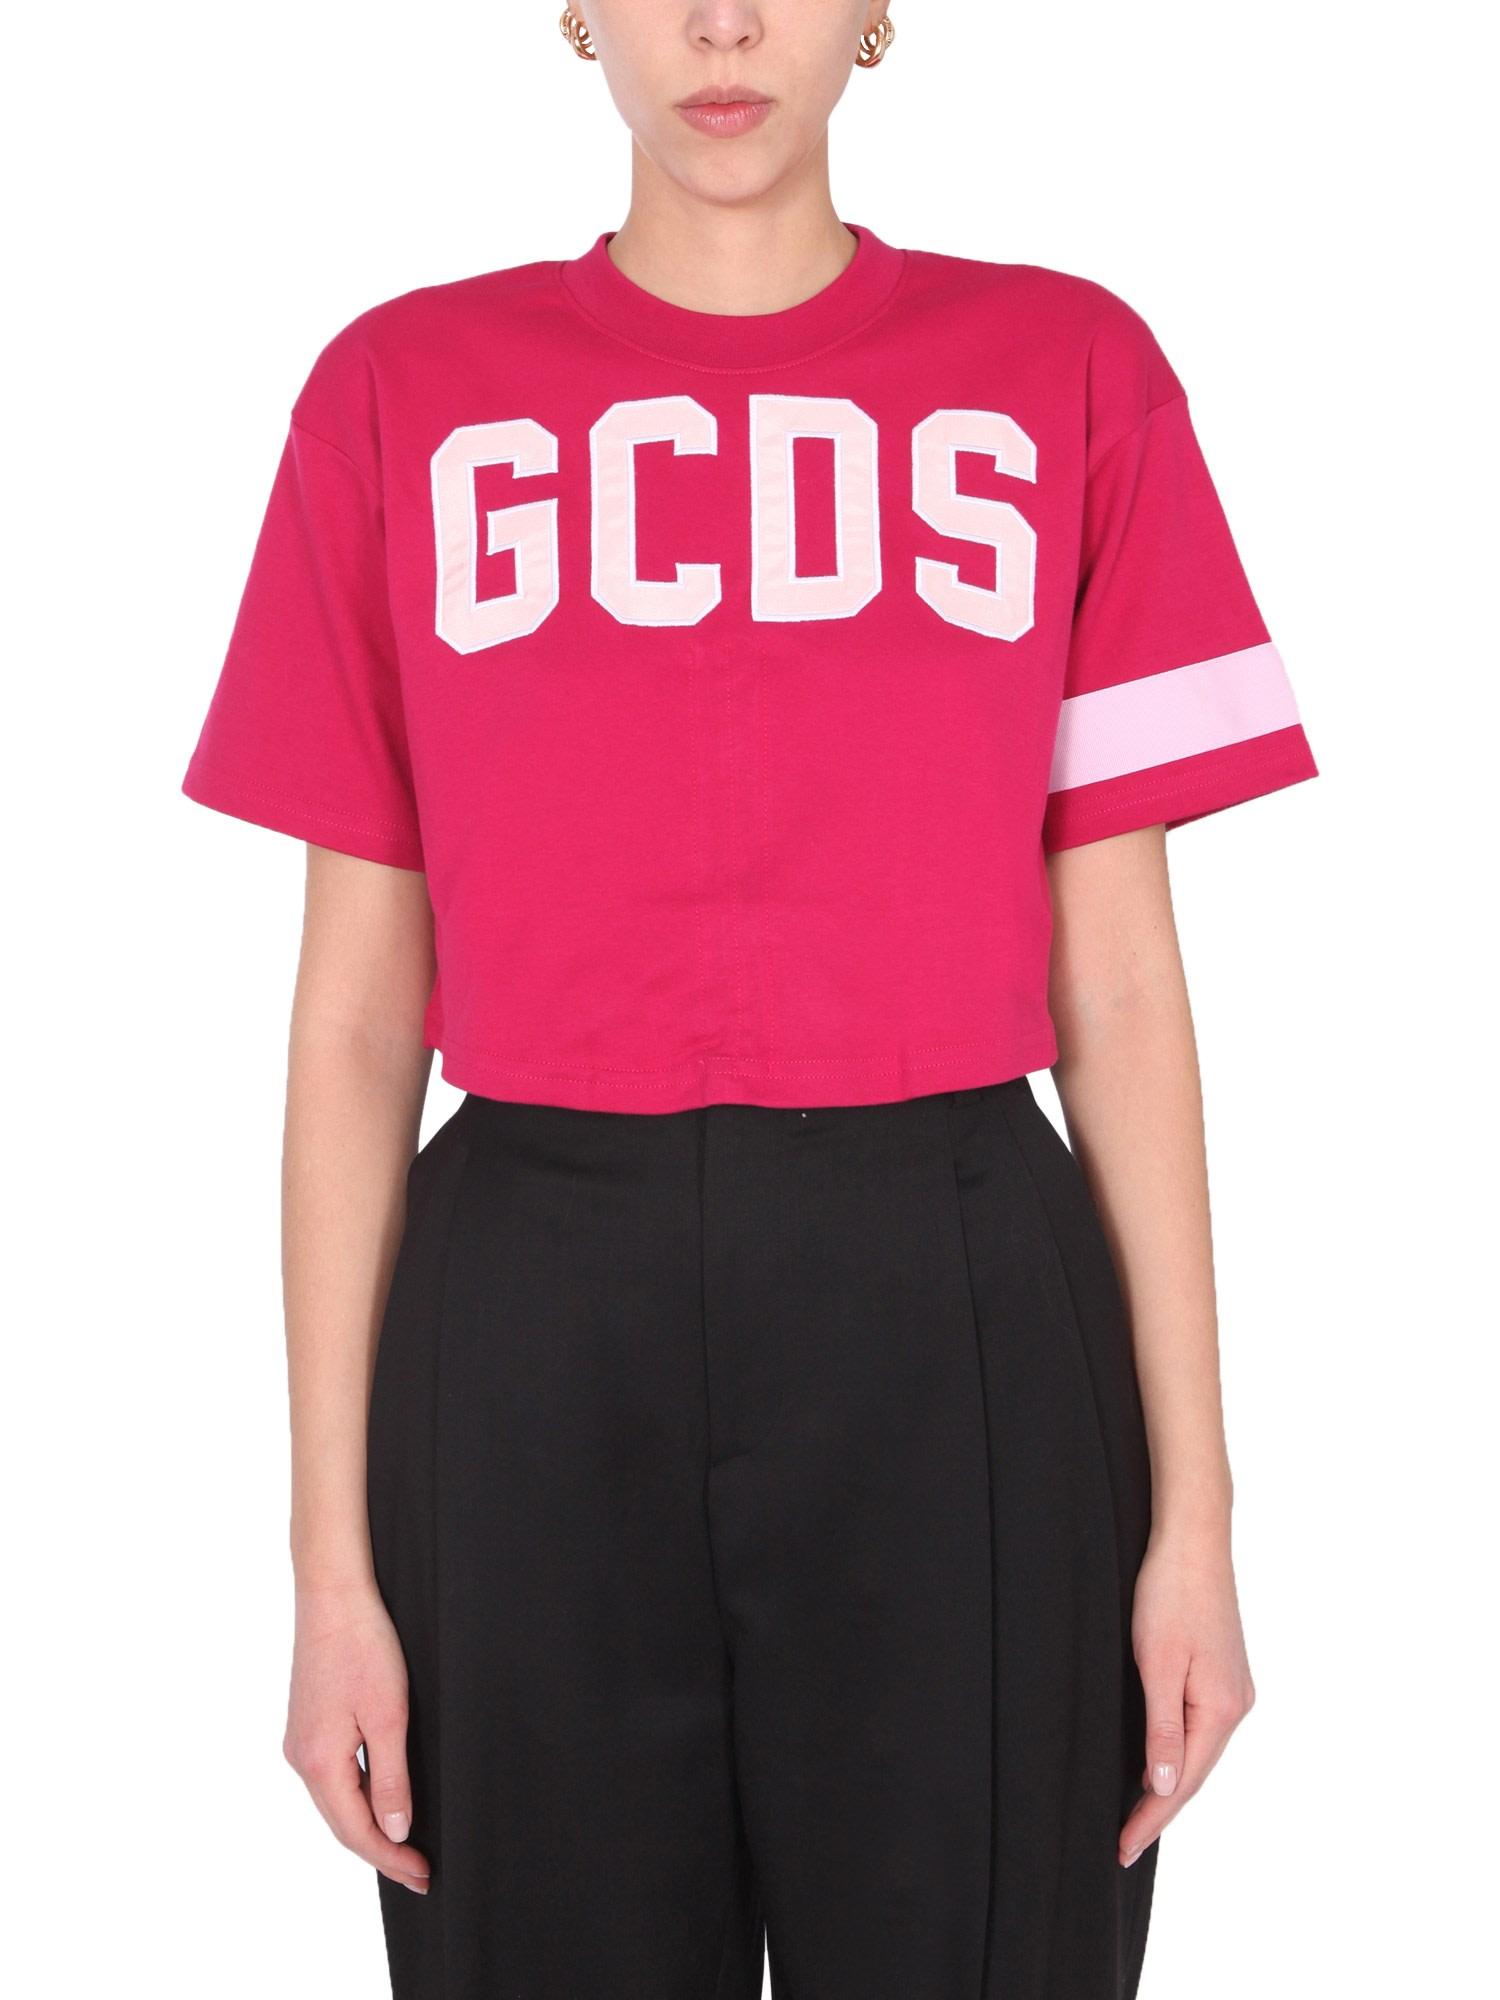 Gcds Cottons CROPPED T-SHIRT